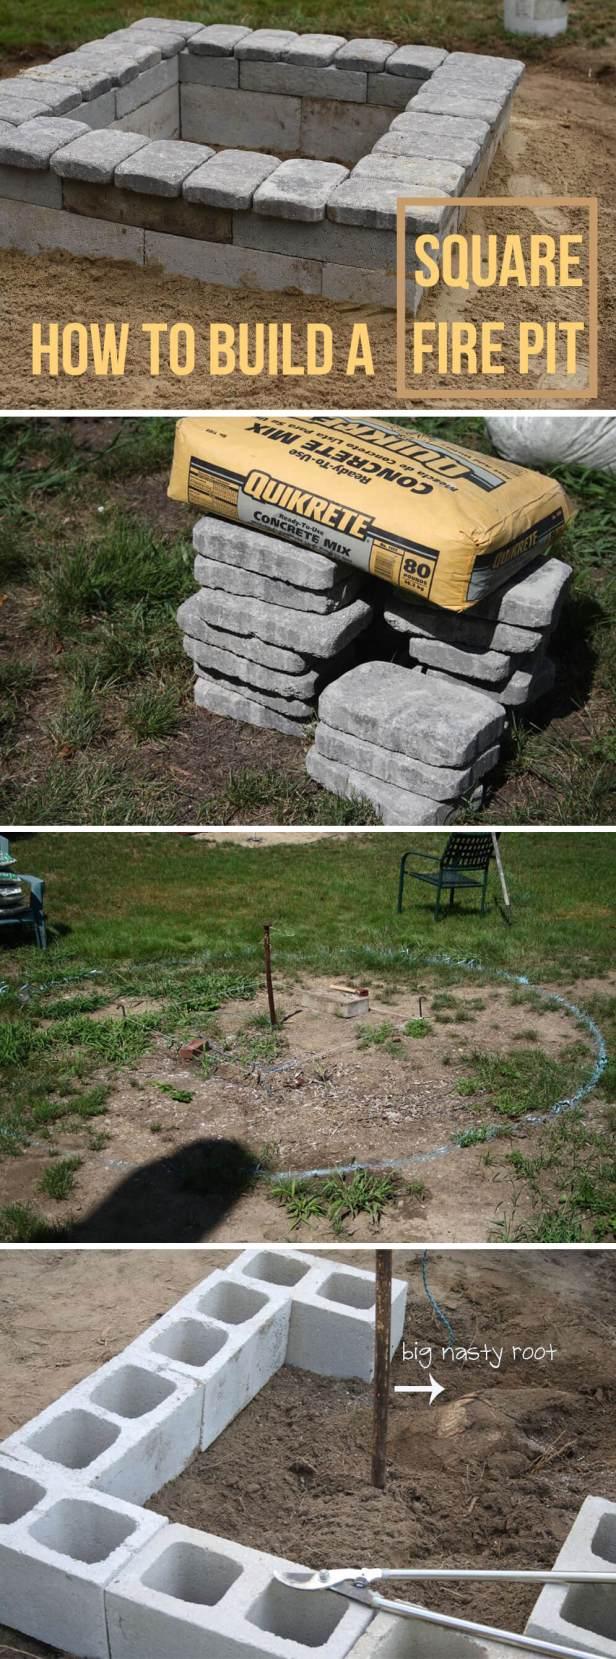 Square Concrete and Stone Firepit